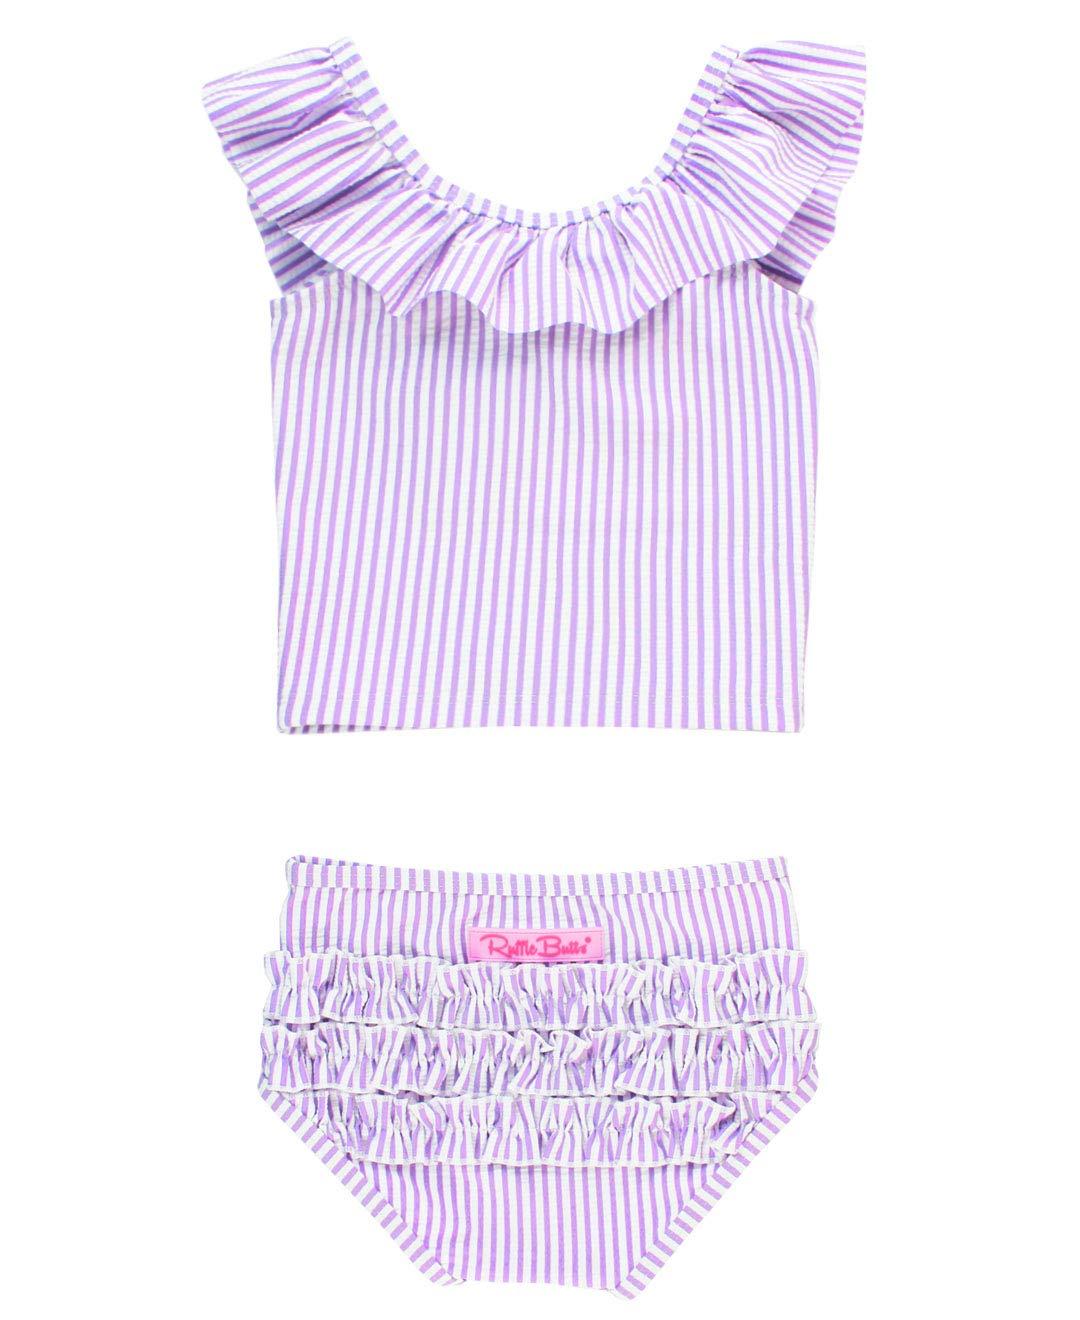 RuffleButts Baby/Toddler Girls Ruffle Crop Top Tankini Swimsuit 2-Piece UPF 50+ Sun Protection